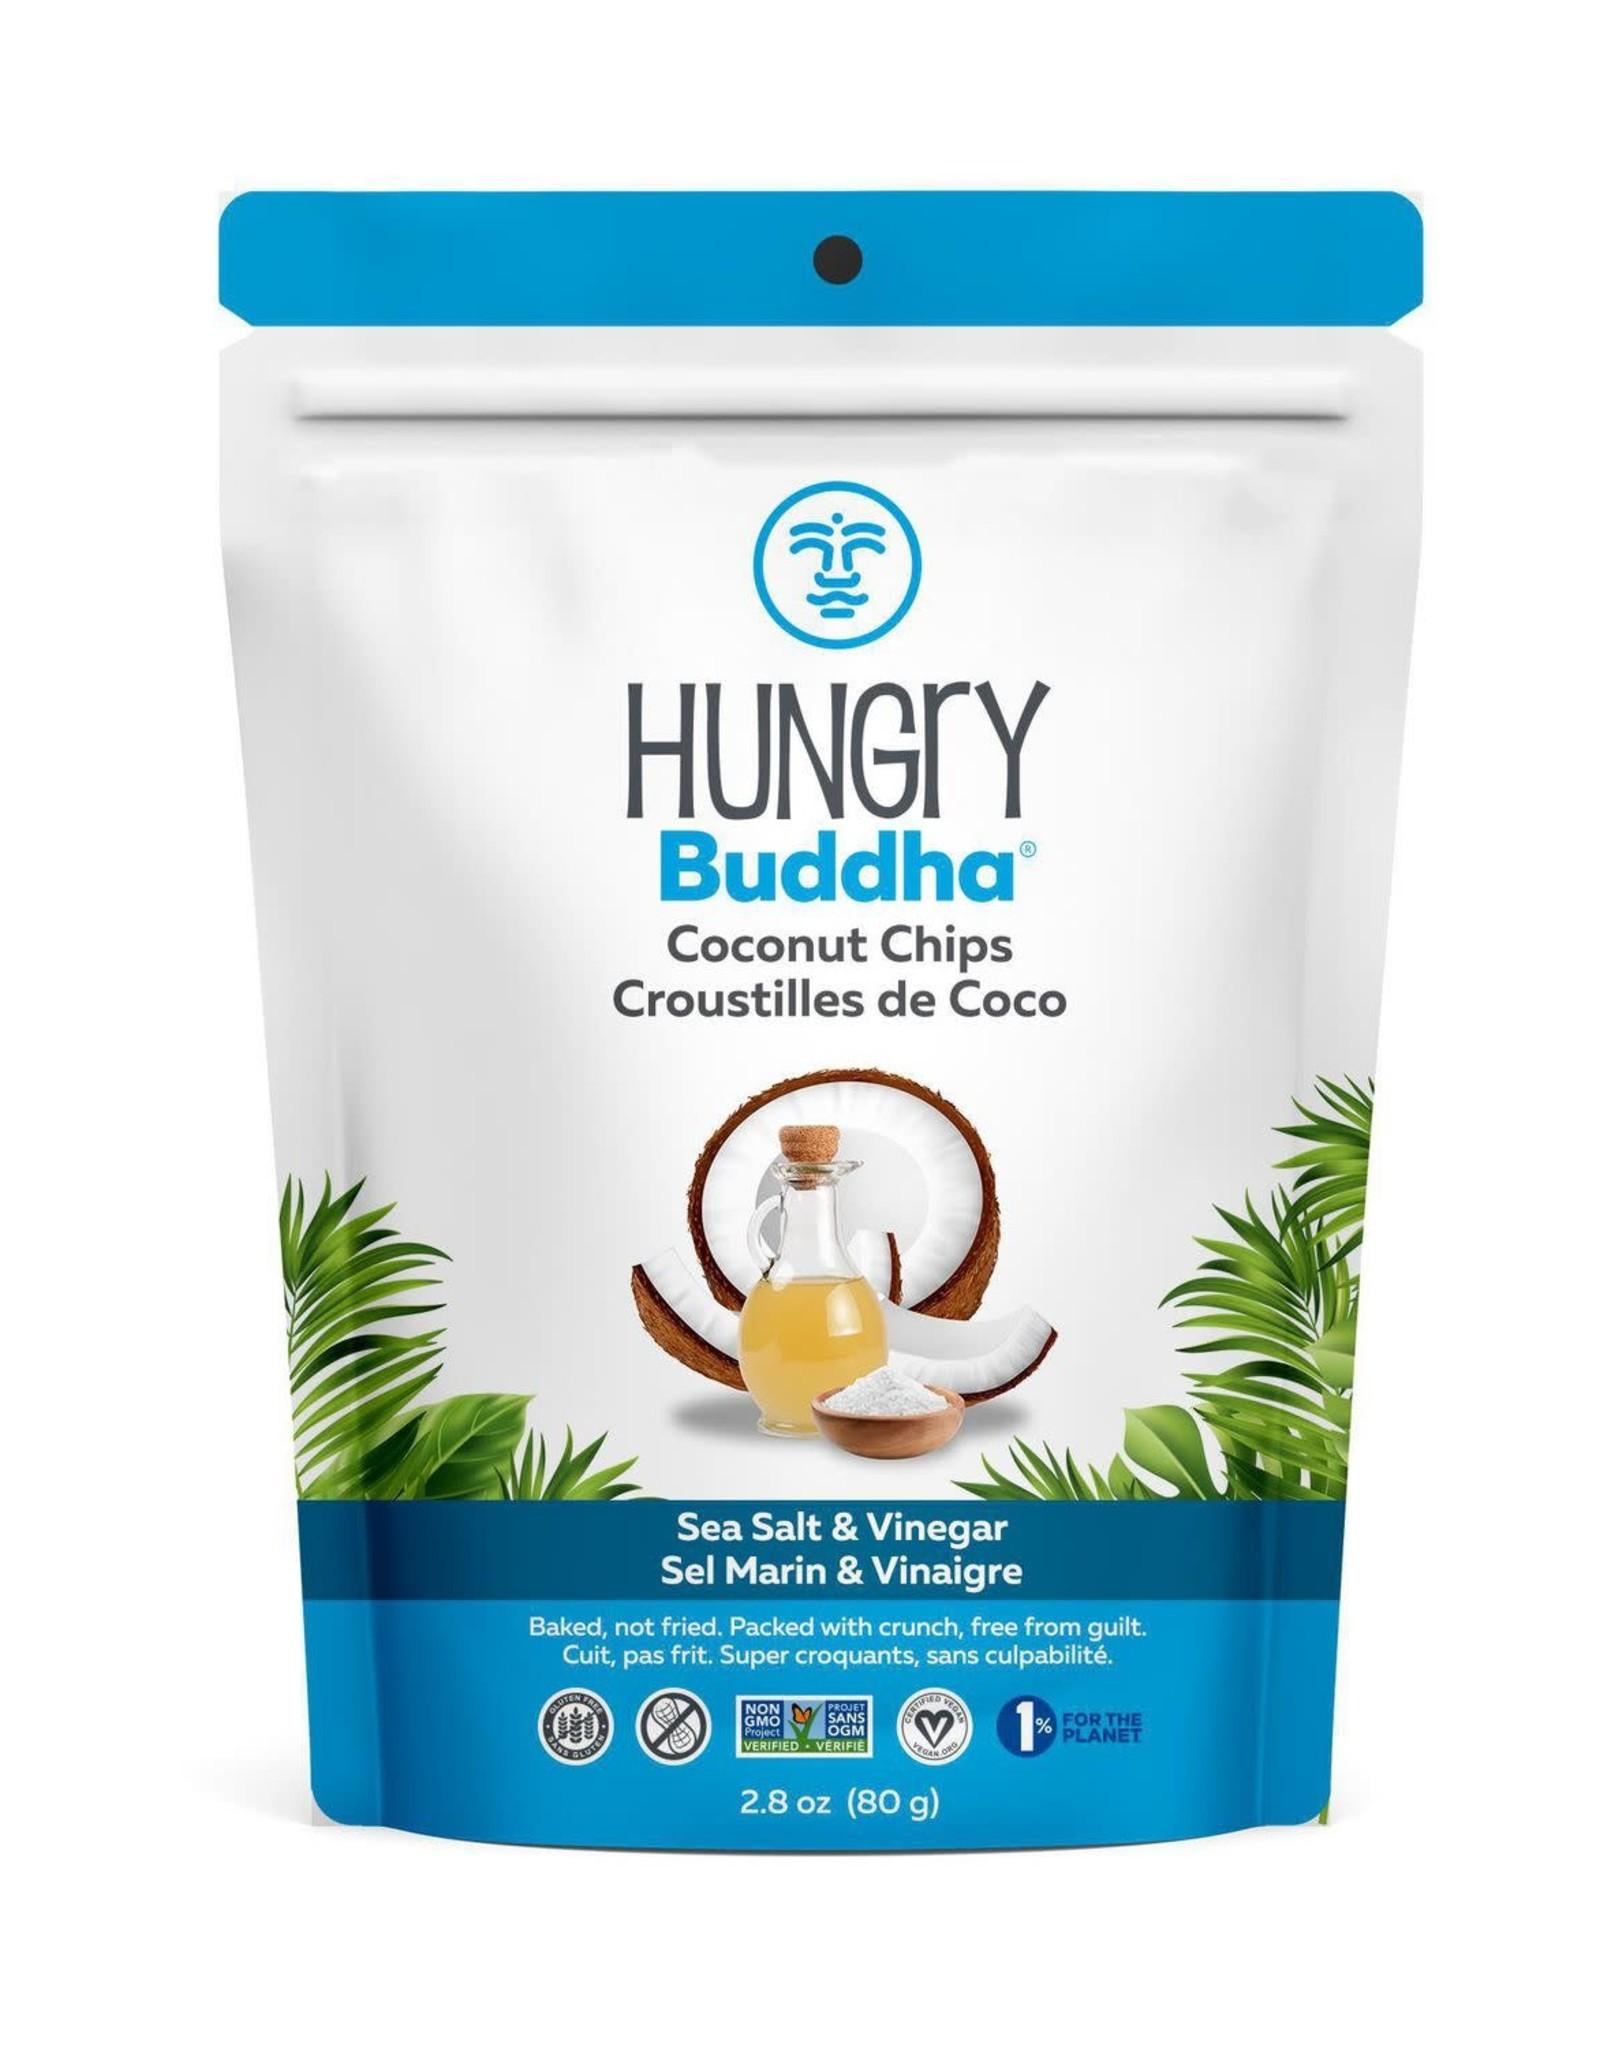 Hungry Buddha Hungry Buddha - Coconut Chips, Salt & Vinegar (80g)